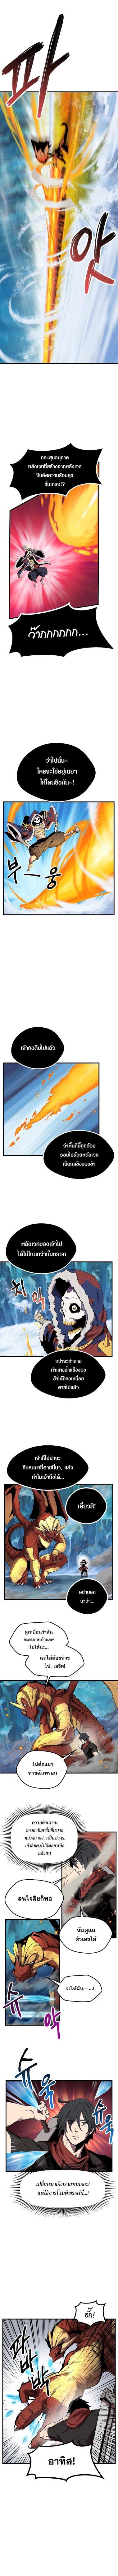 Survival of Blade King - หน้า 4